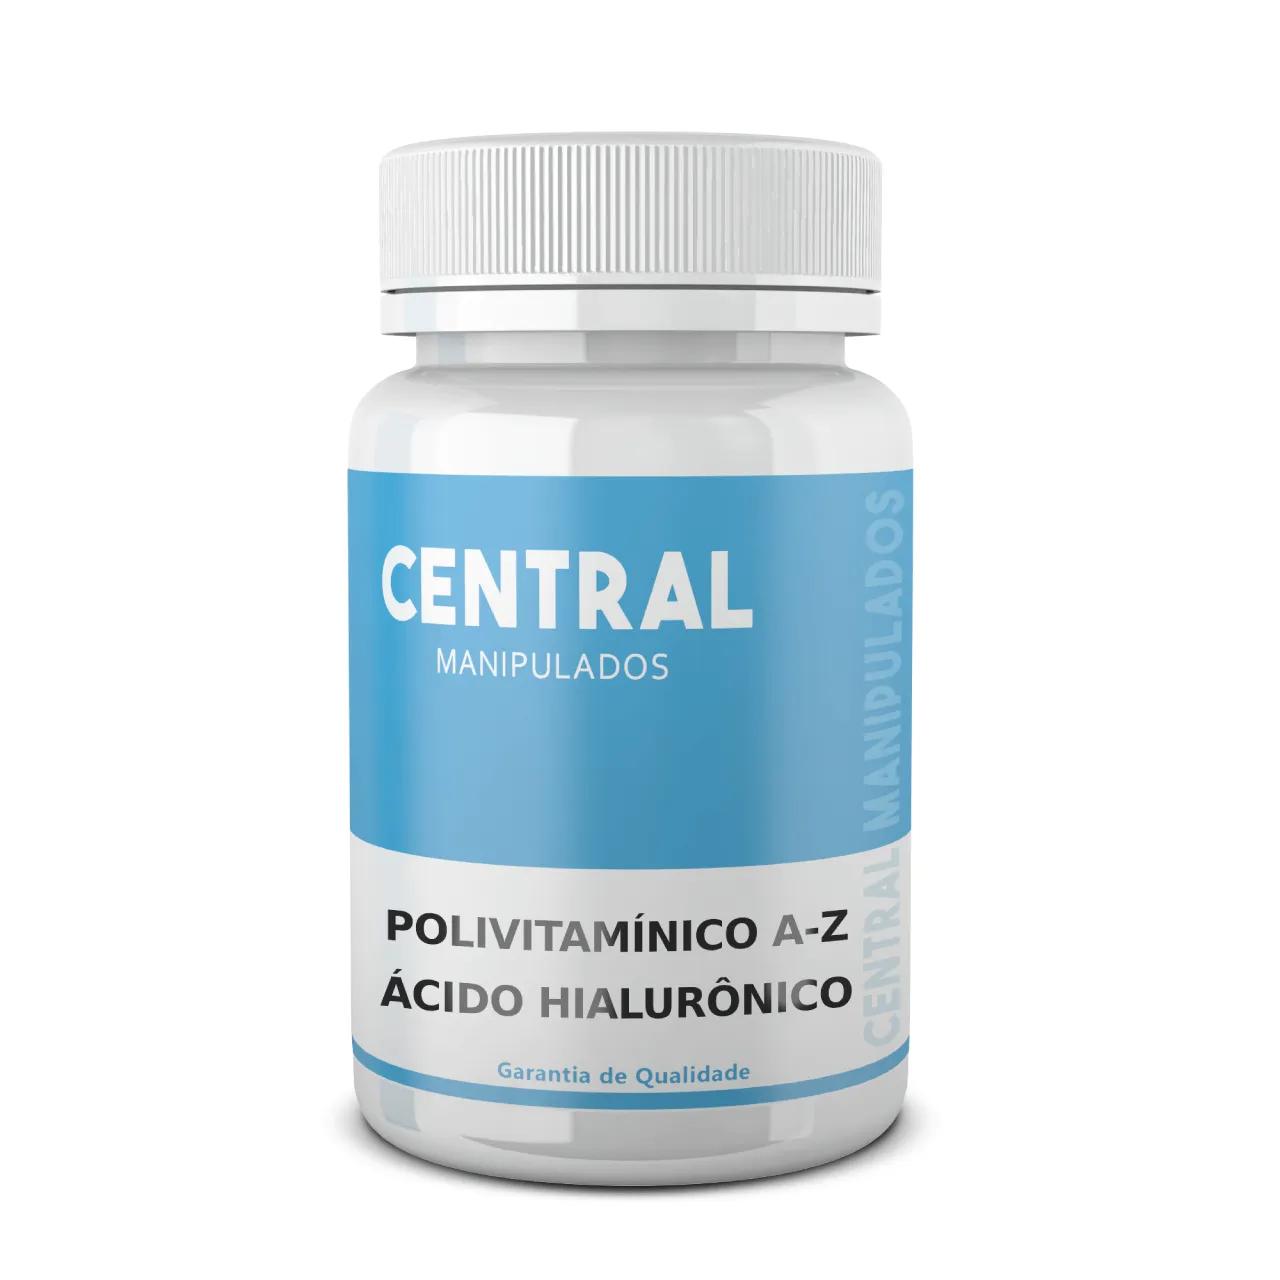 Polivitamínico de A-Z + Ácido Hialurônico 50mg - 60 Cápsulas - Vitaminas, Minerais e Saúde da Pele